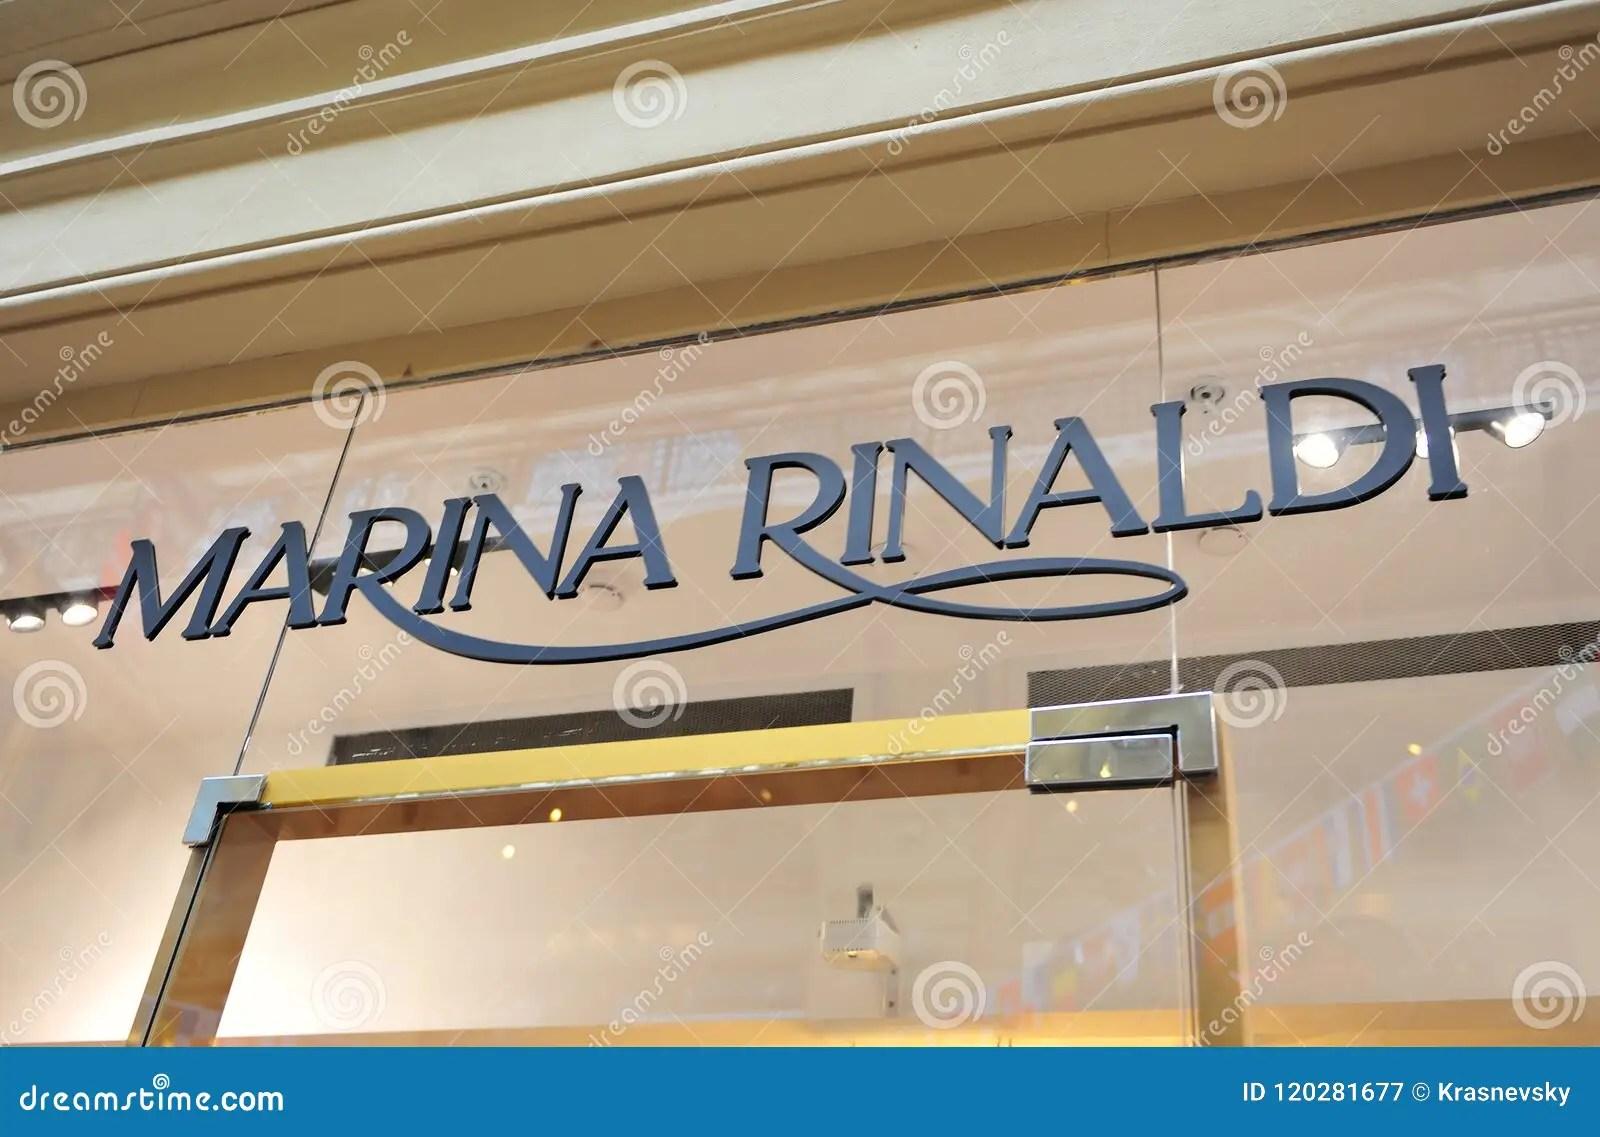 marina rinaldi logo stock